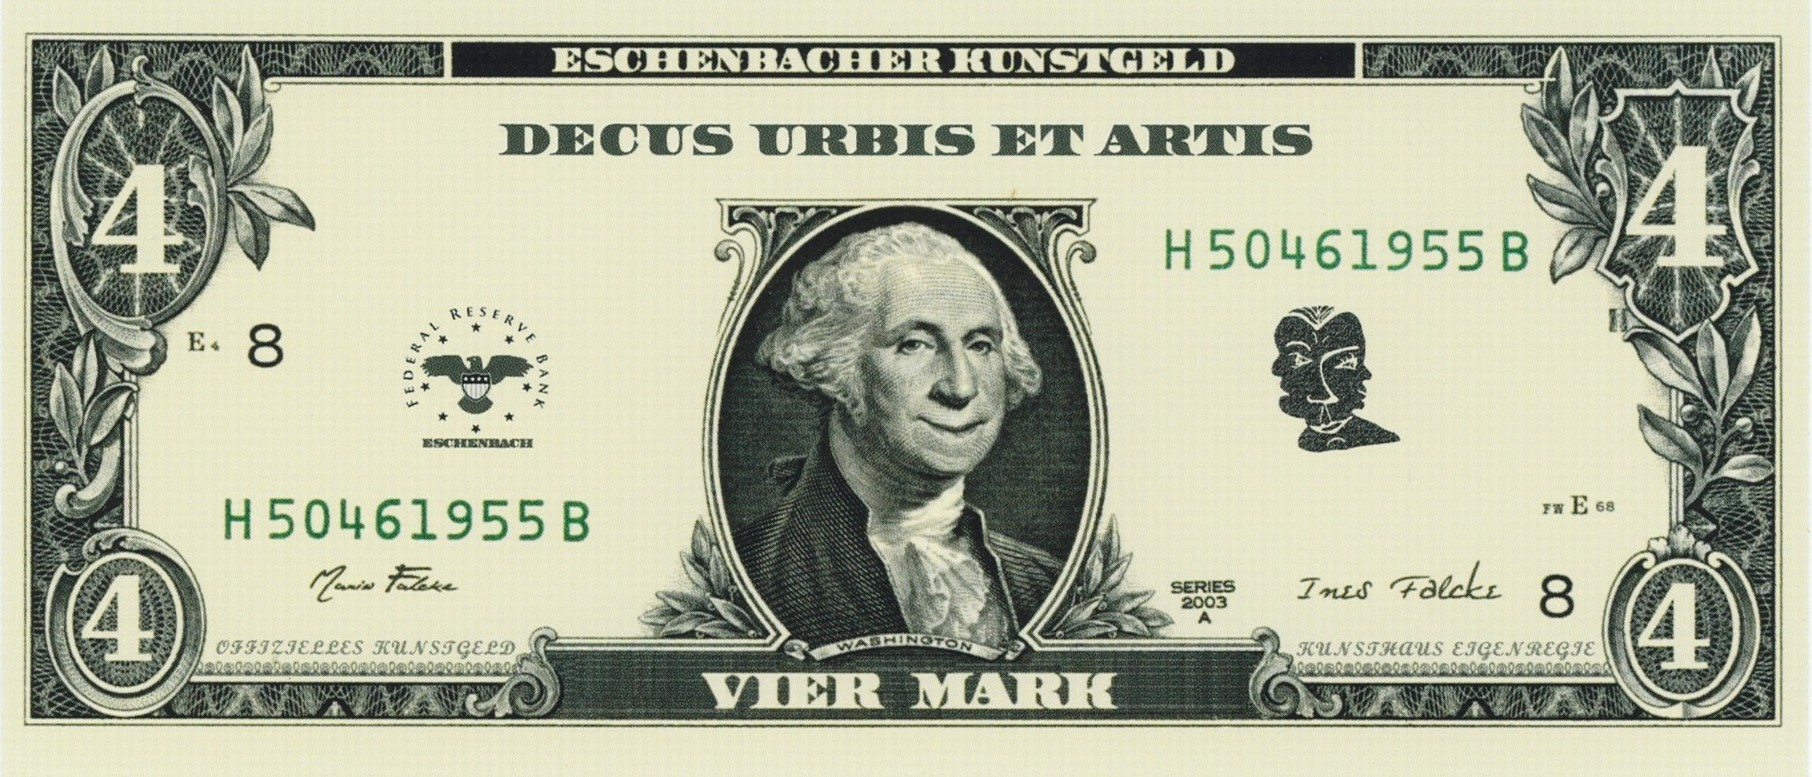 Eschenbacher Kunstgeld